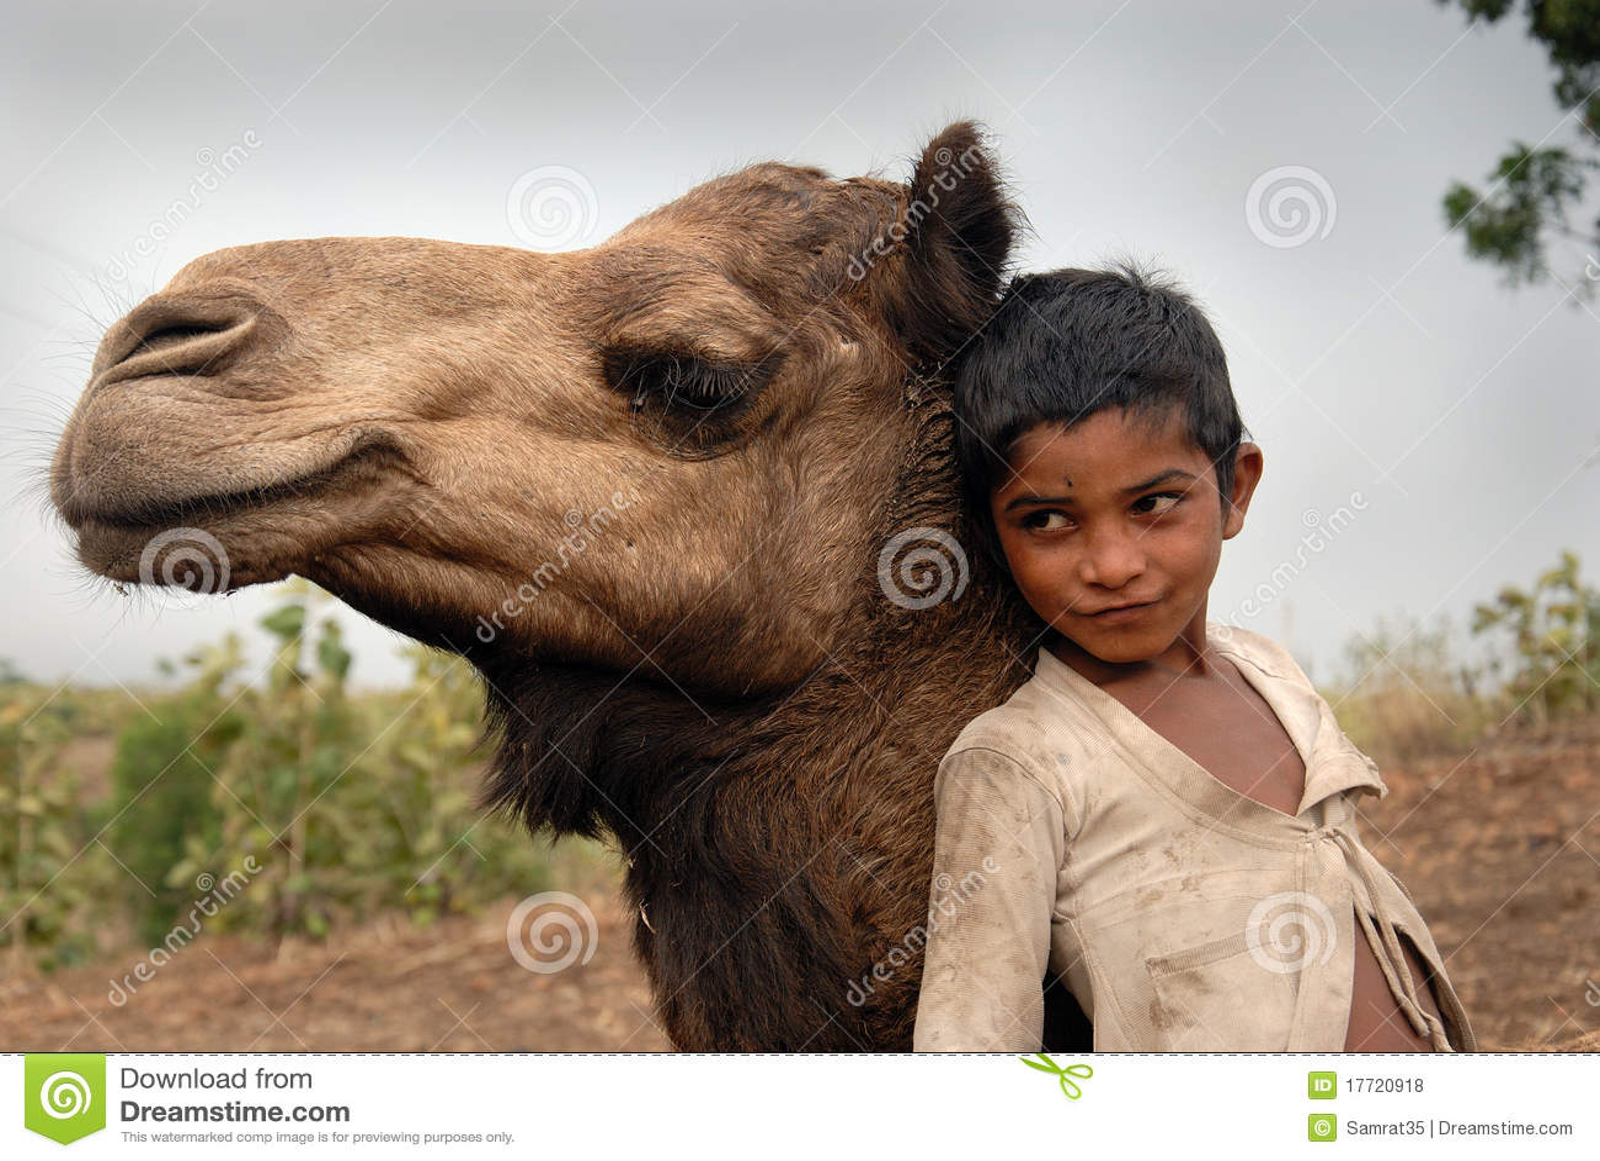 Tribù di Banjara in India